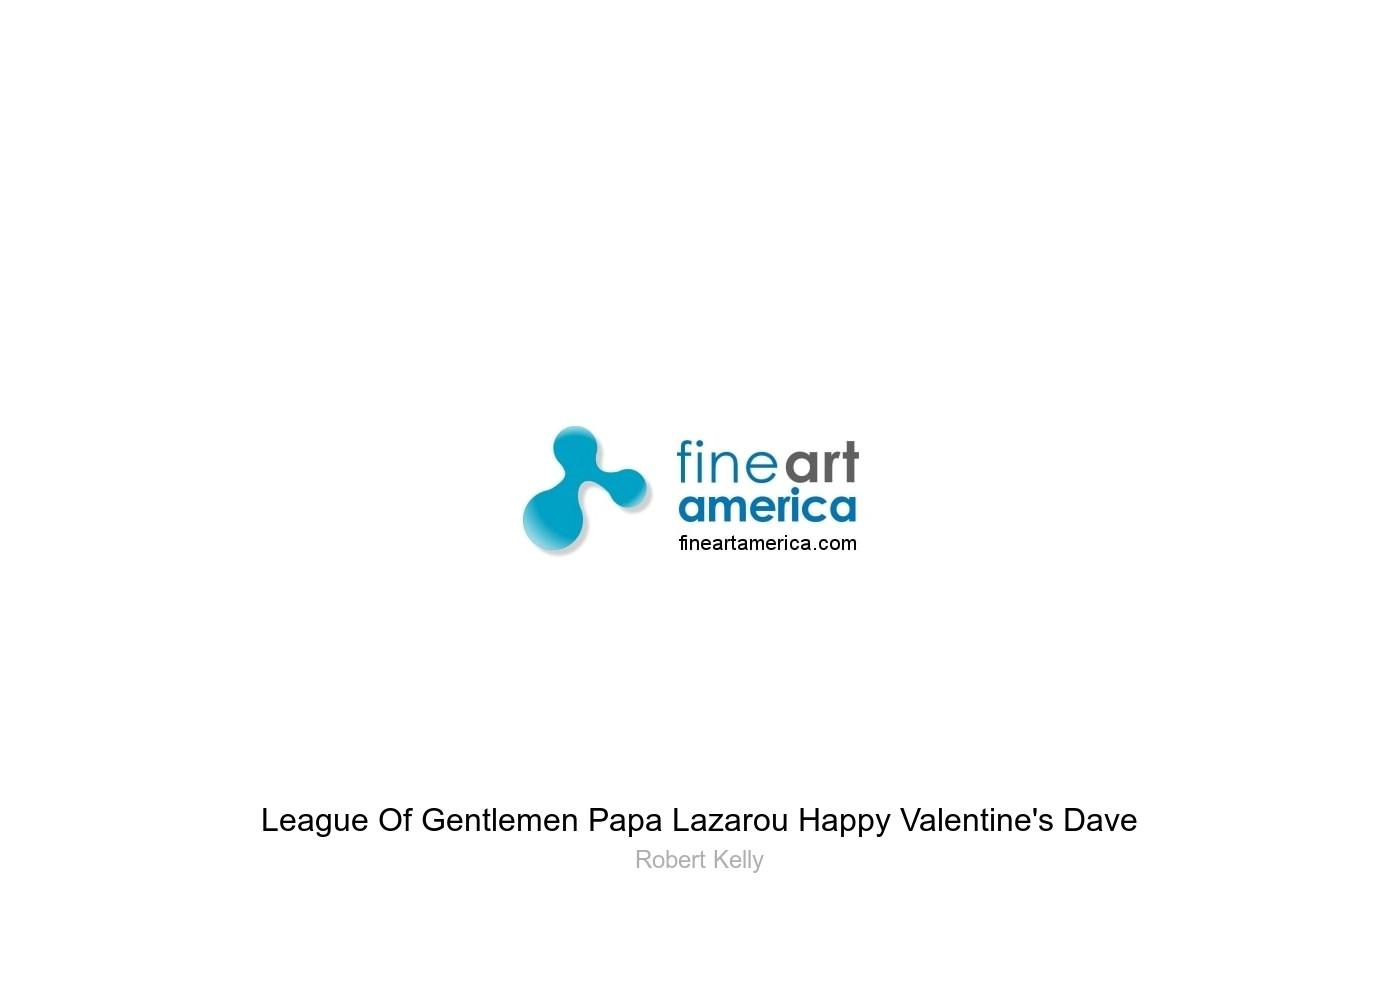 League Of Gentlemen Papa Lazarou Happy Valentine S Dave Greeting